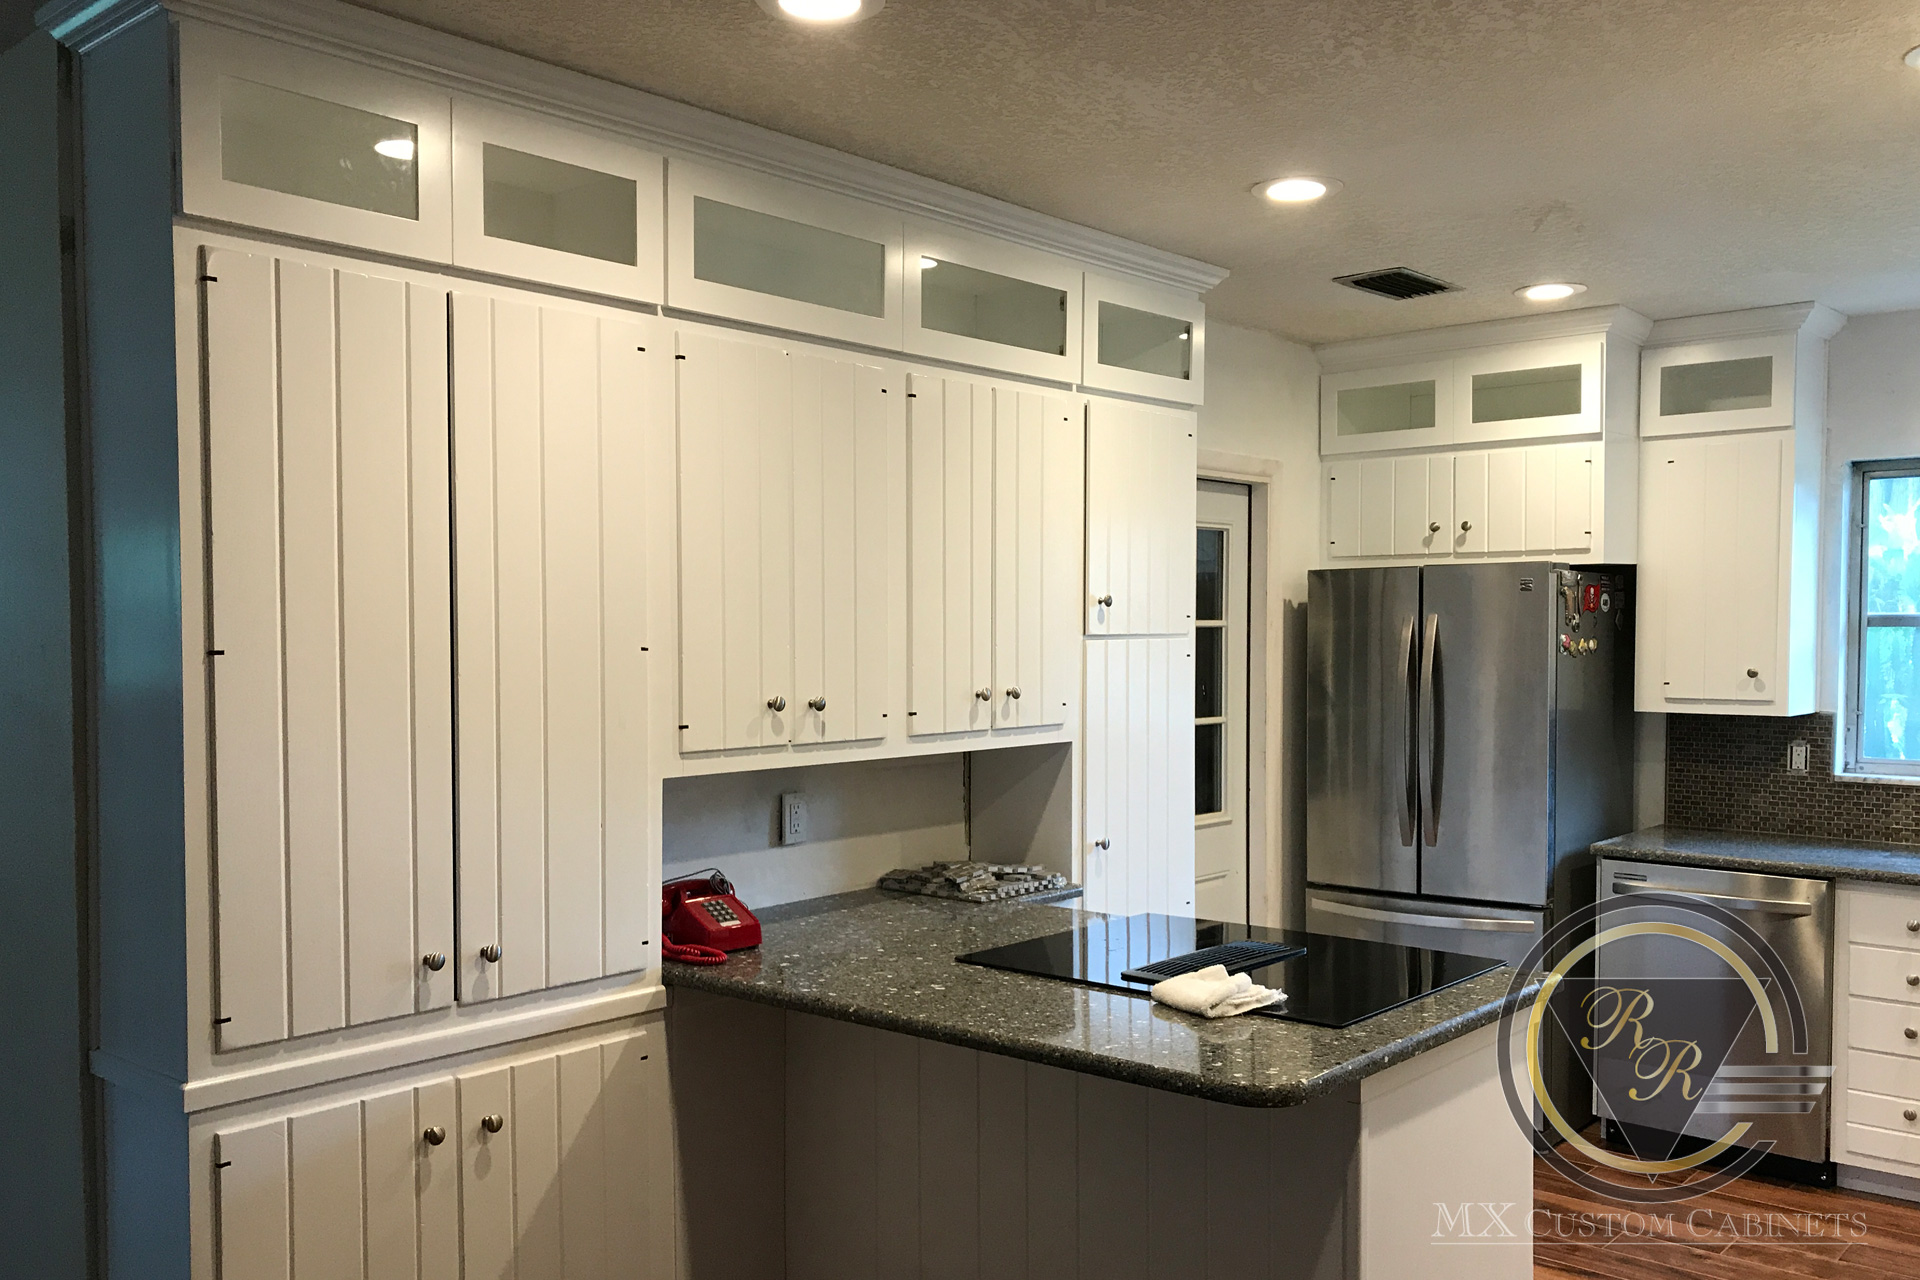 Mx Custom Cabinets Premium Custom Cabinetry Largo St Pete Tampa